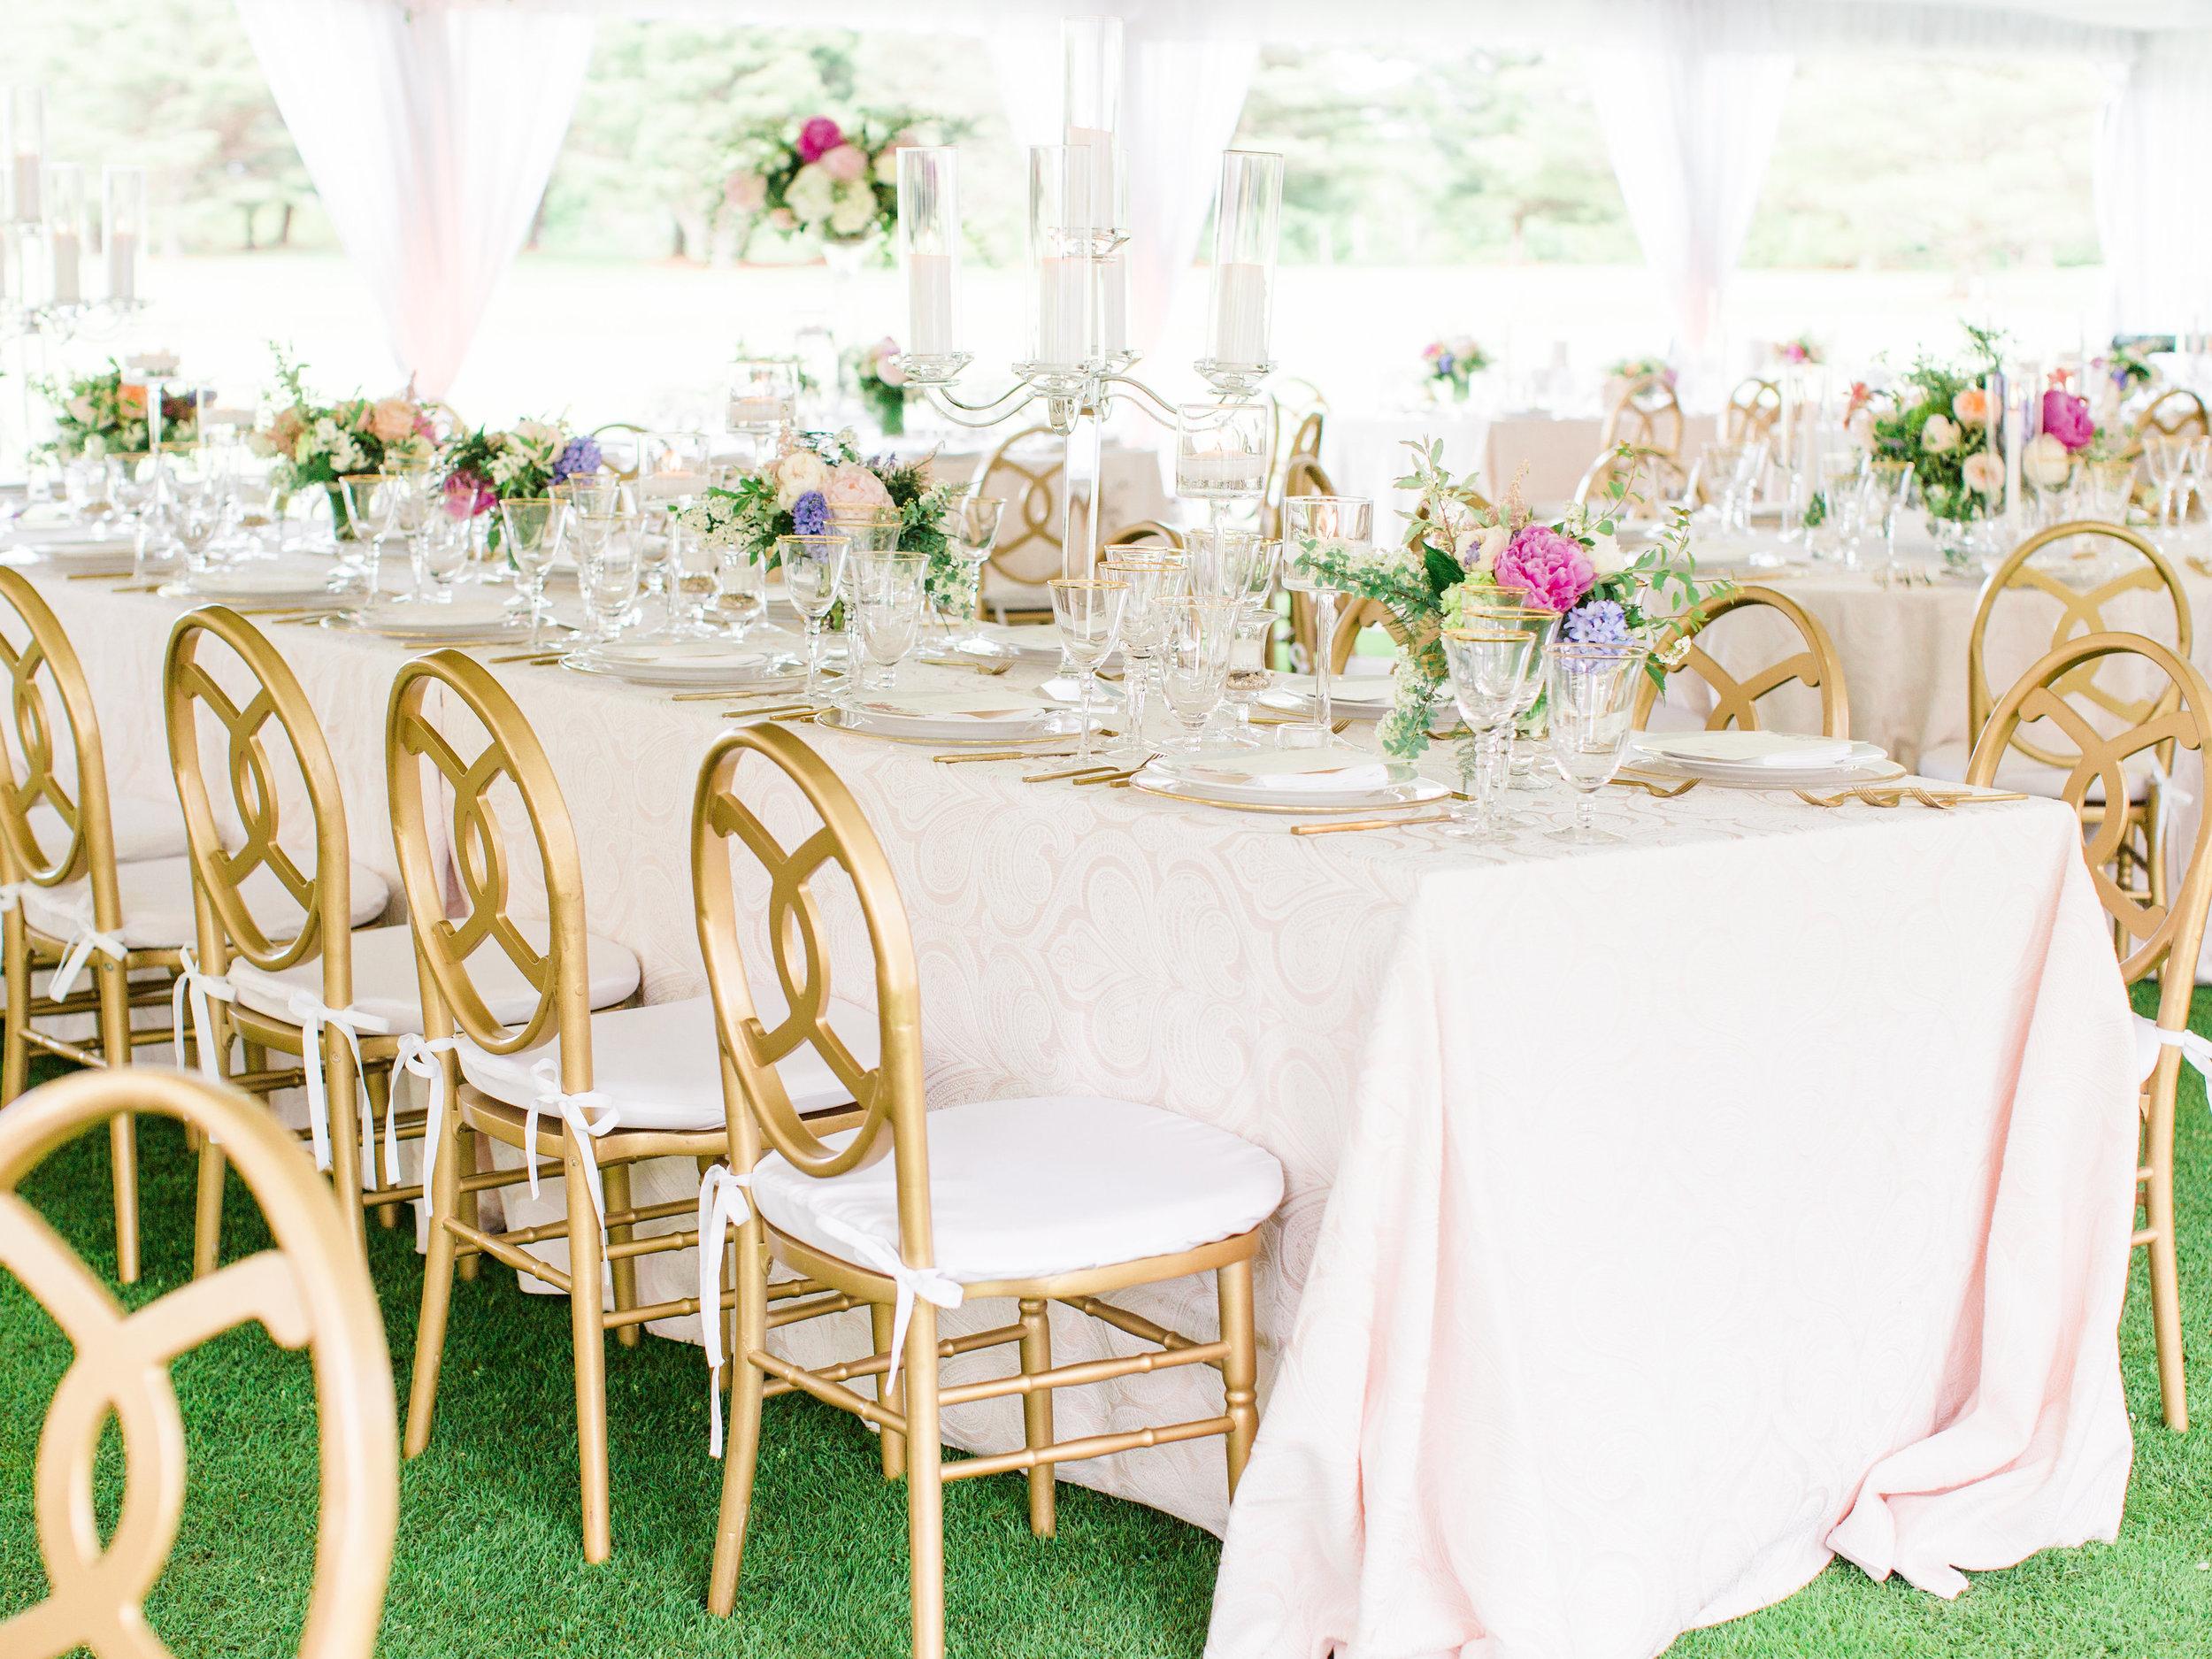 Coffman+Wedding+Reception+Details-33.jpg